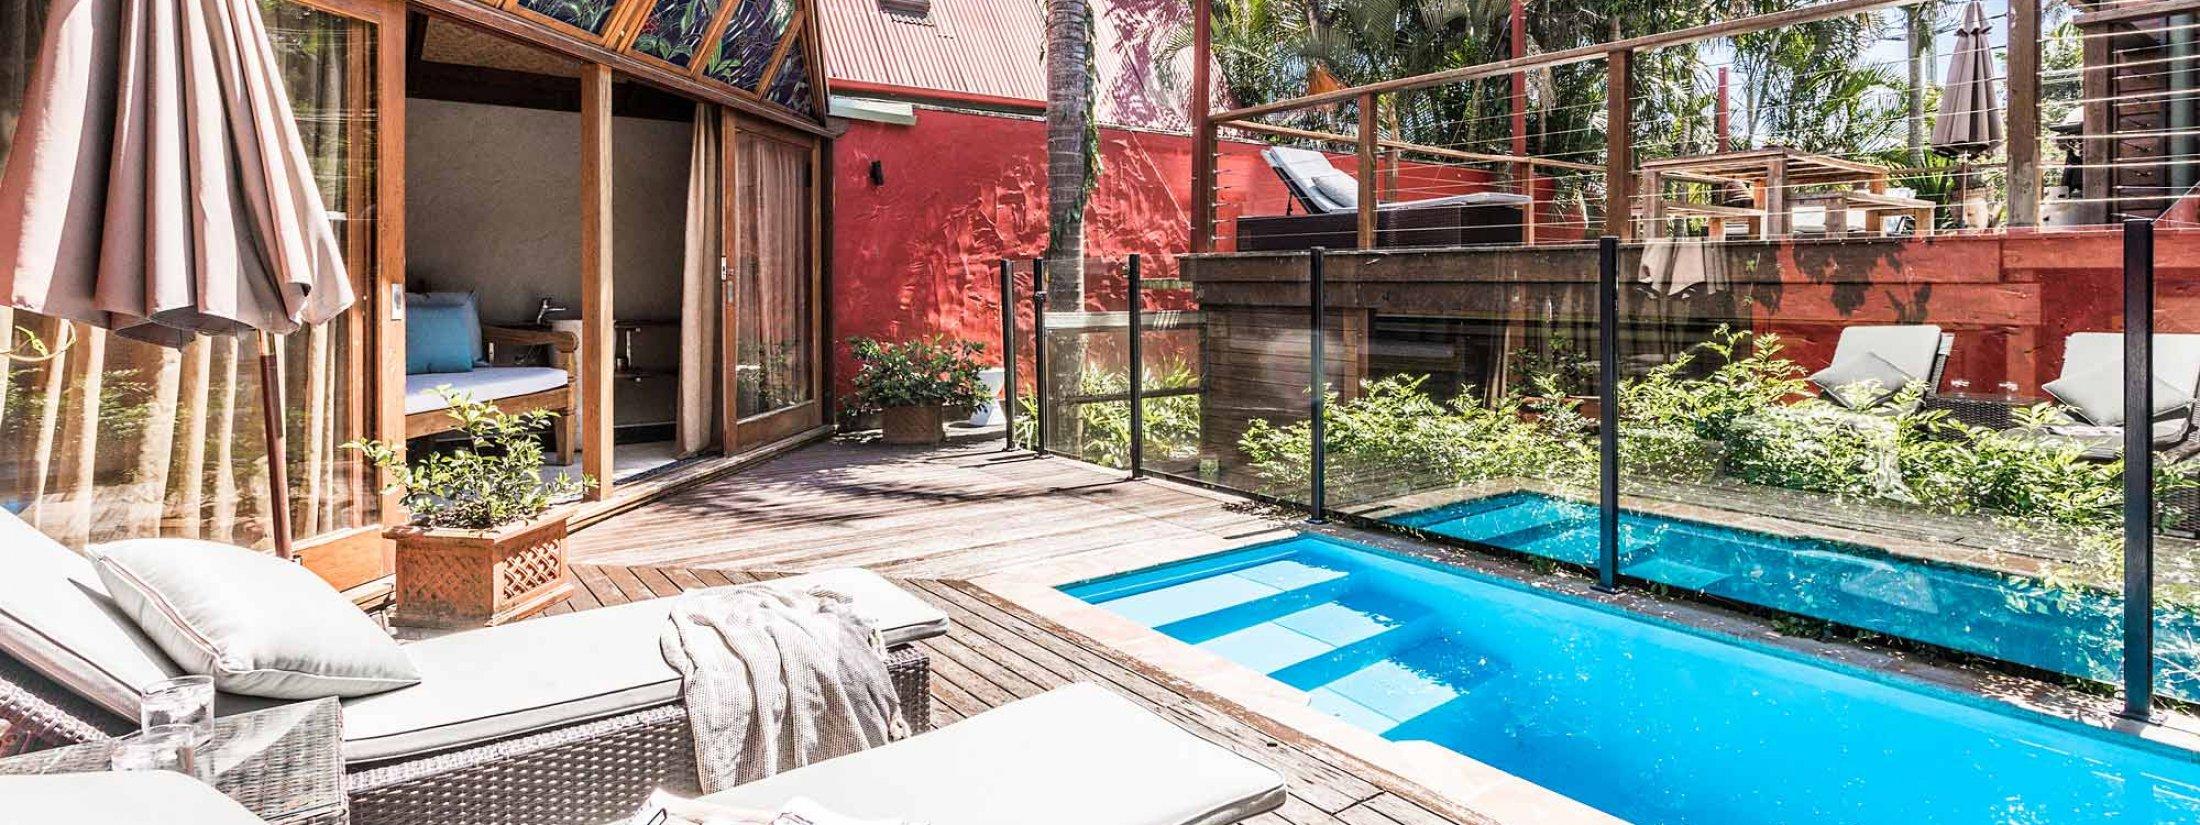 Byron Blisshouse - Byron Bay - Penthouse - Pool and Cabana d